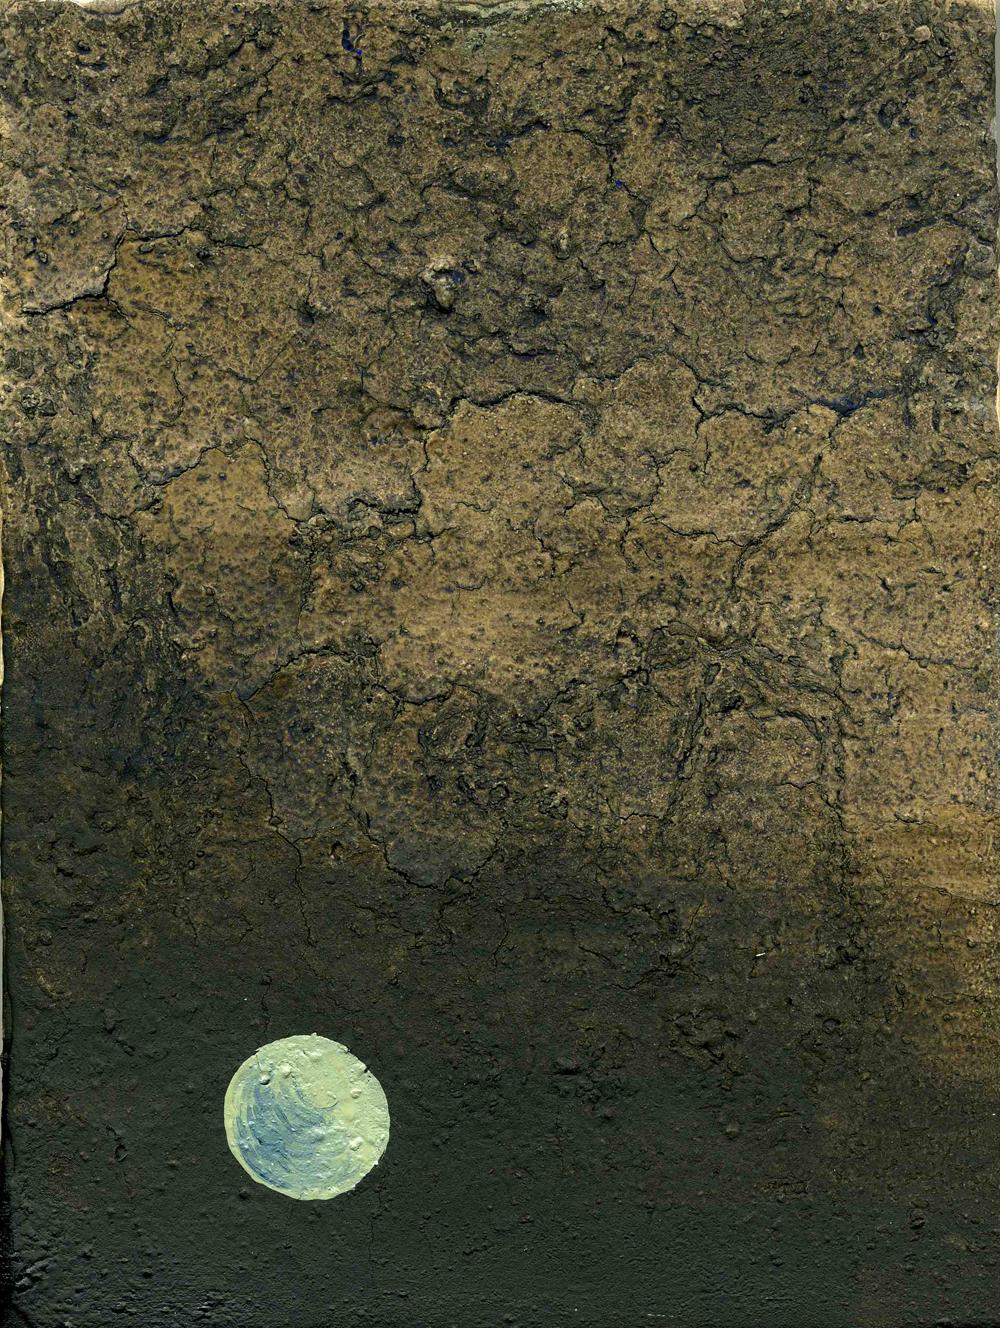 Moon, 2009, Oil on half oil ground, 24 x 18 cm